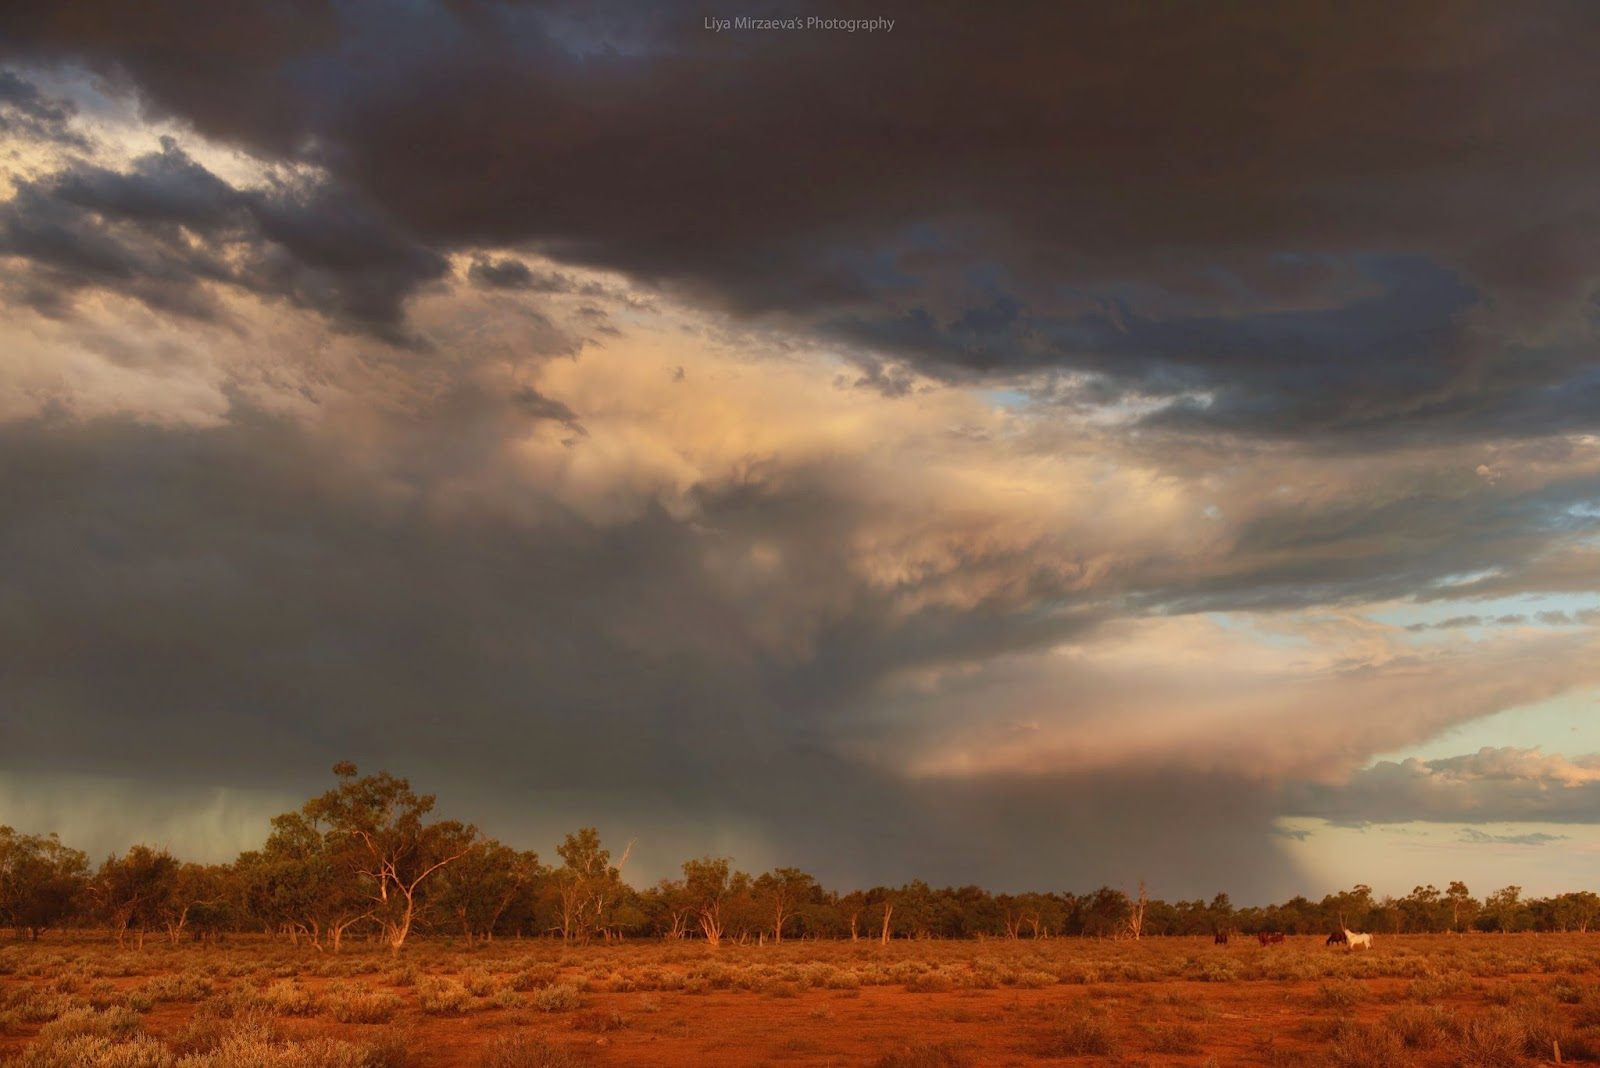 me, travel, traveler, australia, sydney, walgett, journey, amazing, wow, sun, sunset, pretty, storm, trees, nature, clouds, sun, horses, animals, farm, farmer, love